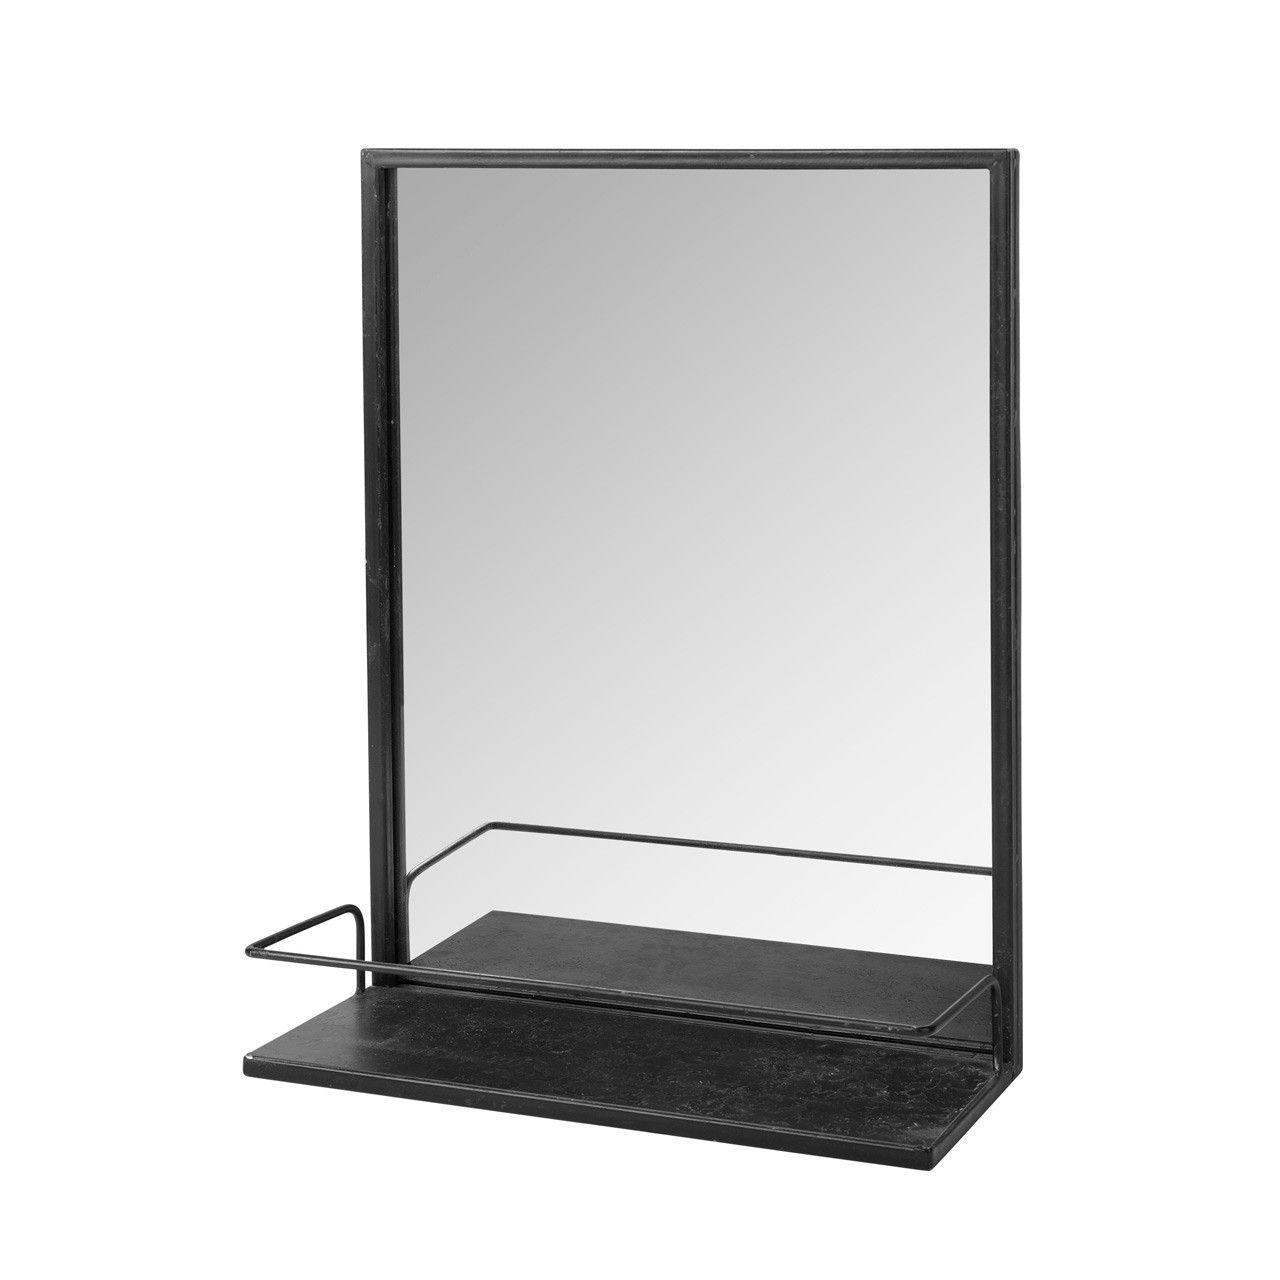 broste copenhagen spiegel met plankje talja ijzer zwart. Black Bedroom Furniture Sets. Home Design Ideas